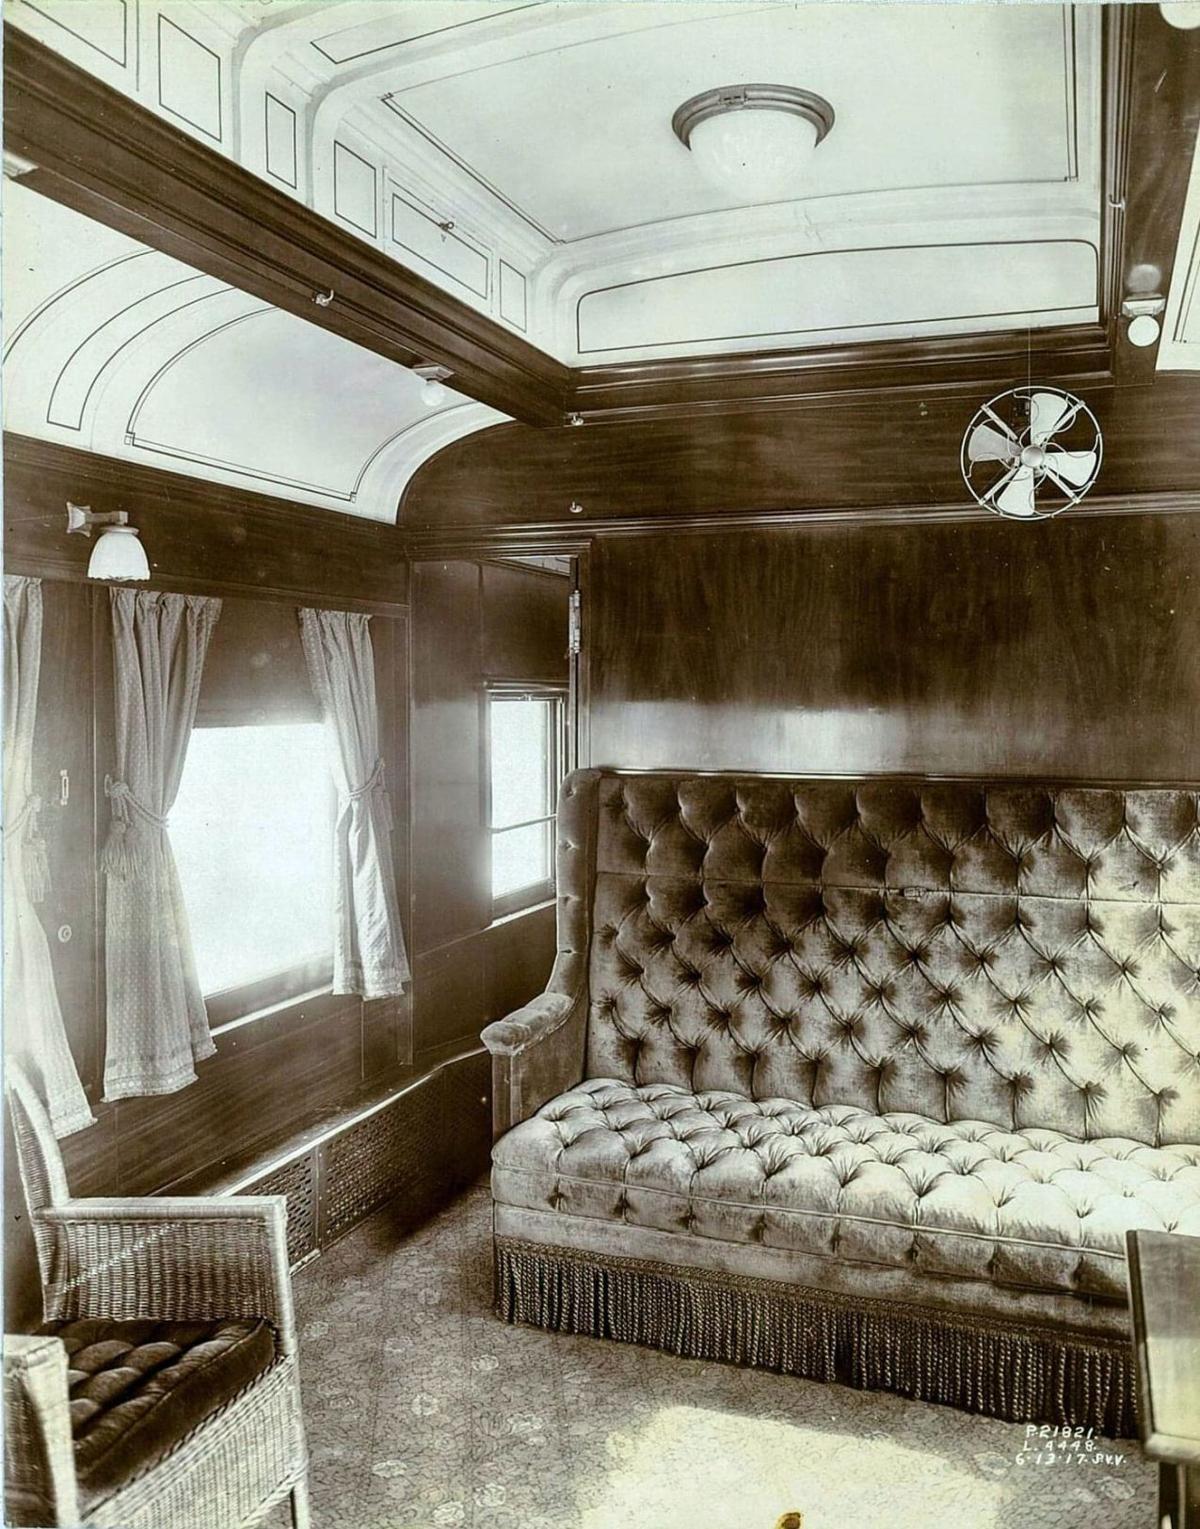 Historic rail car being restored